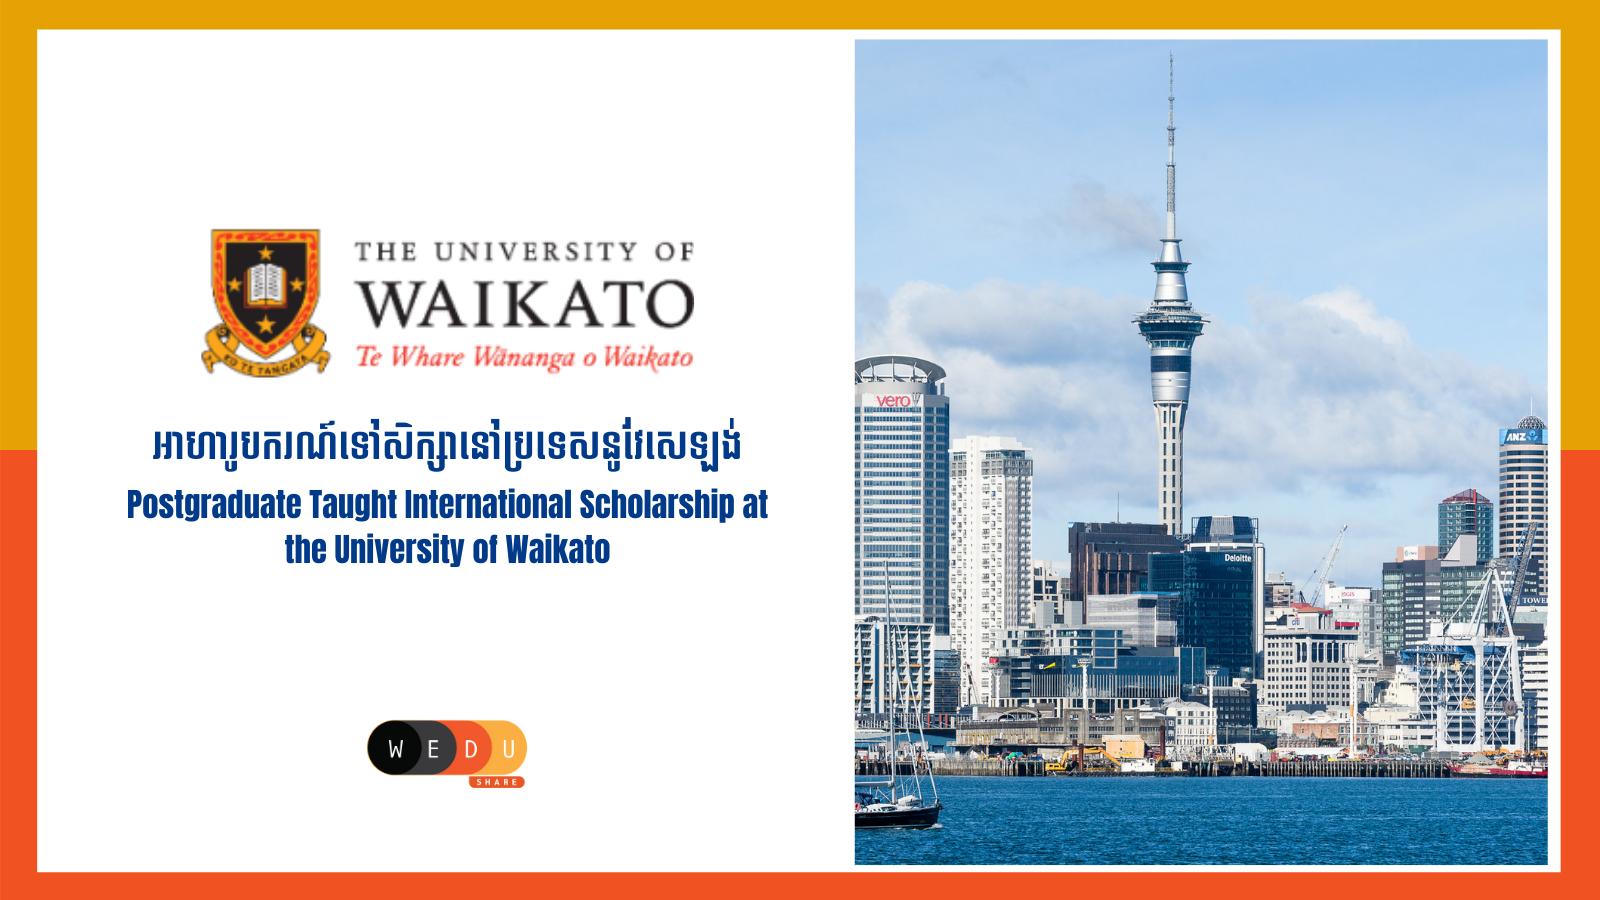 Postgraduate Taught International Scholarship at the University of Waikato